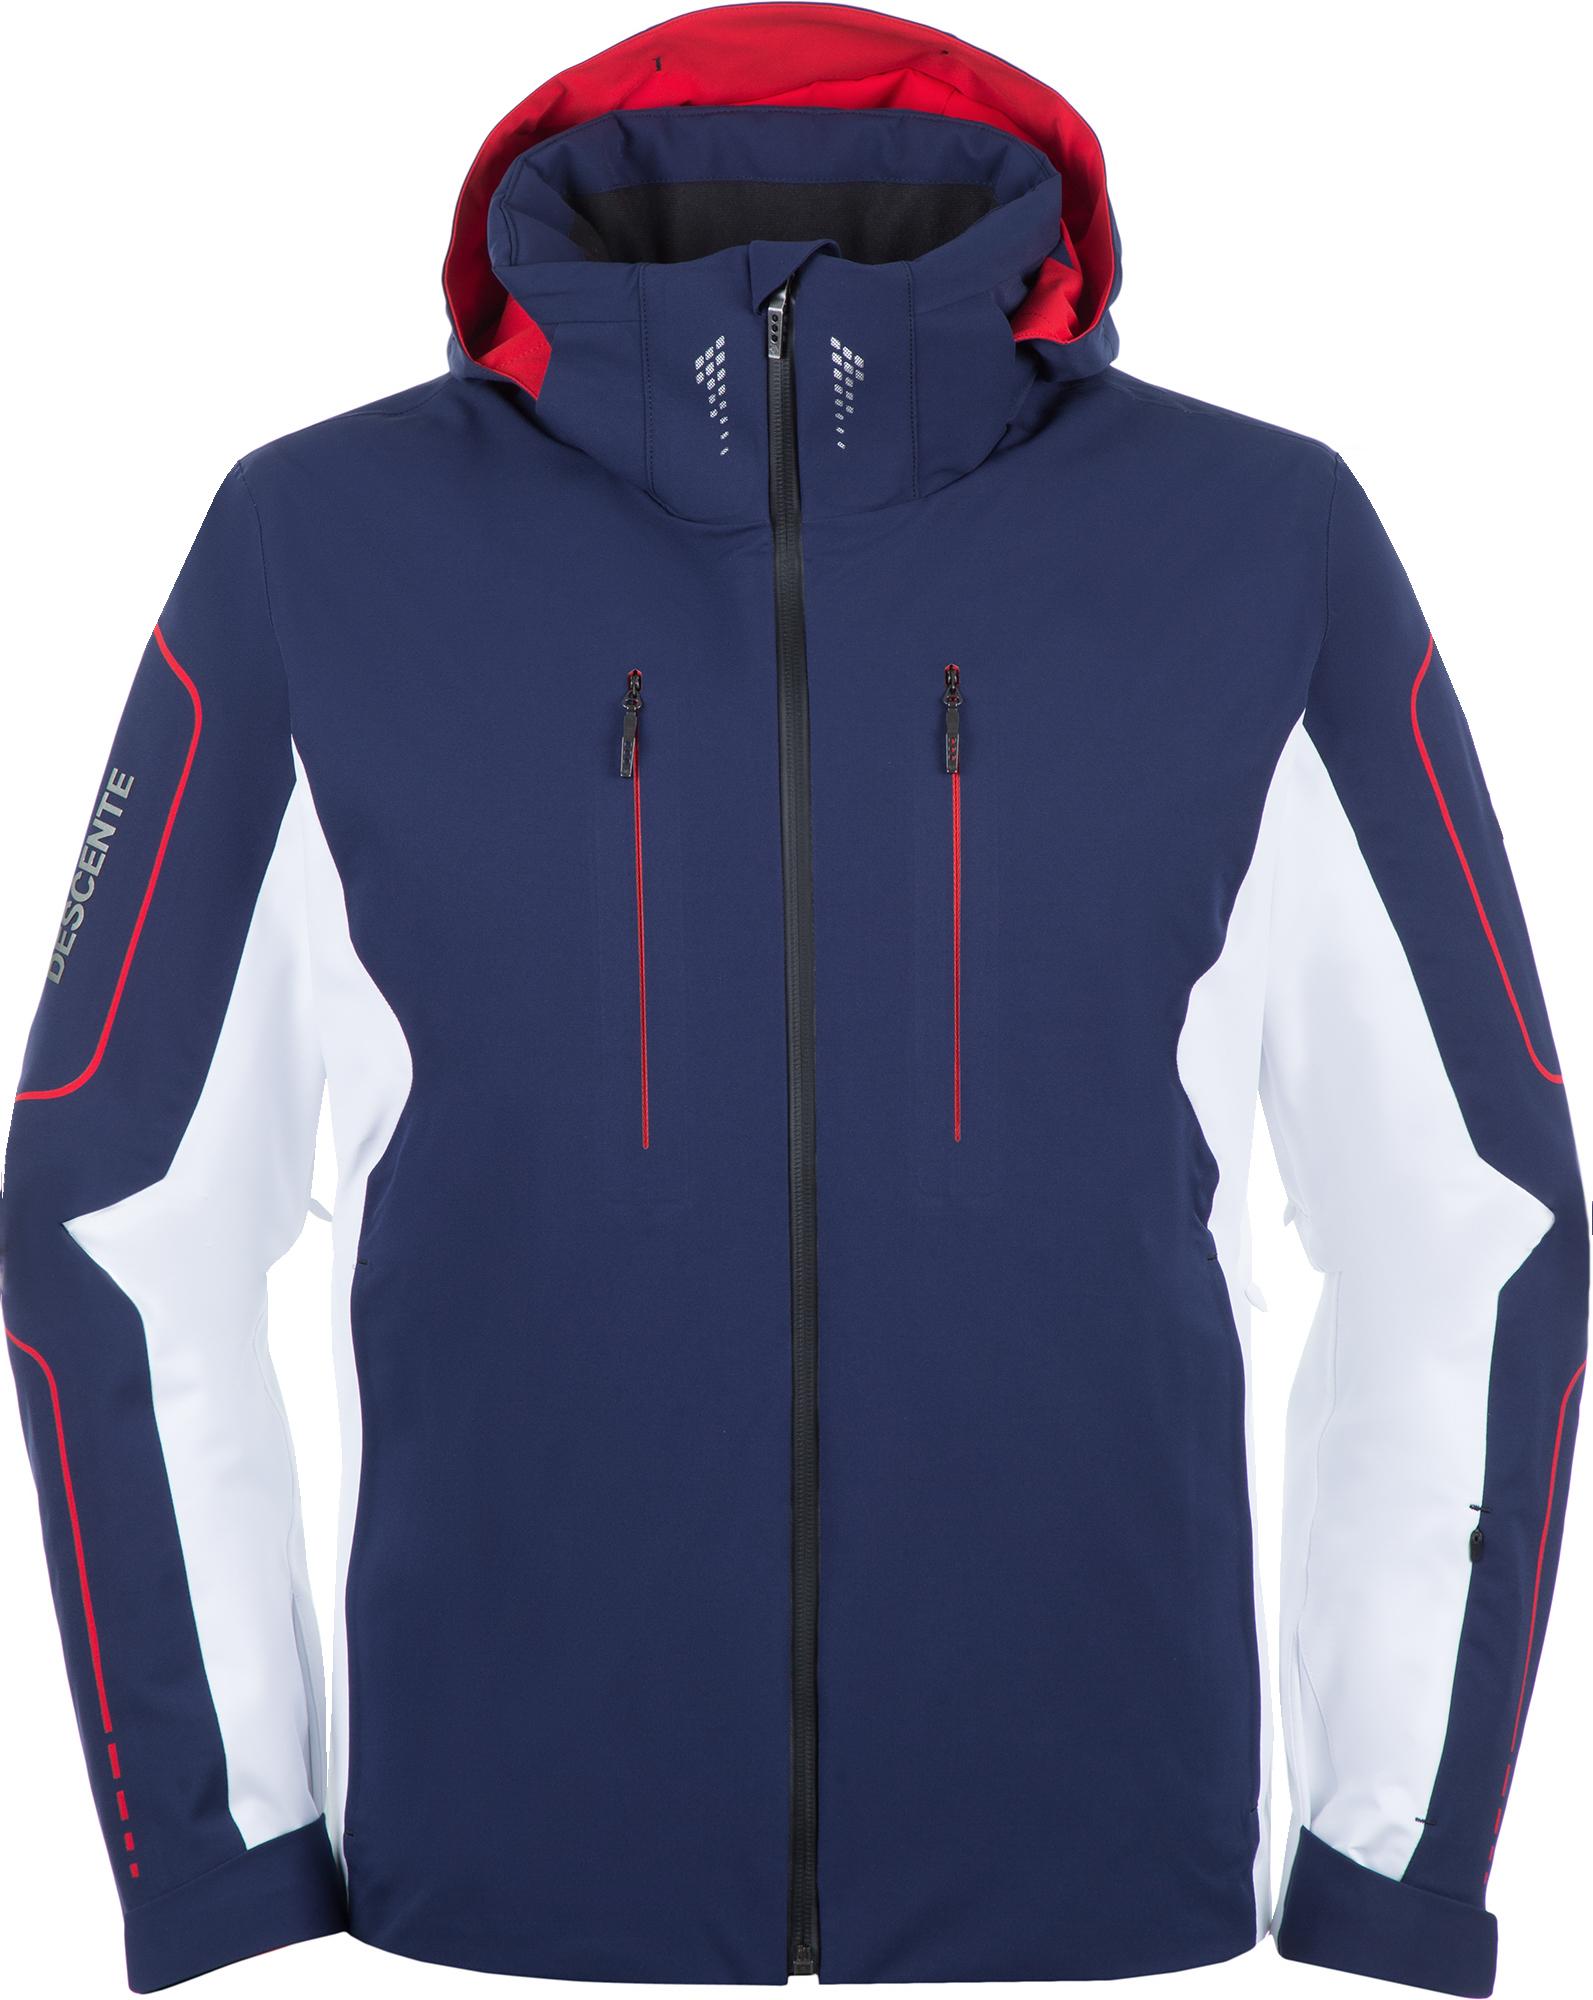 Descente Куртка утепленная мужская Isak, размер 50